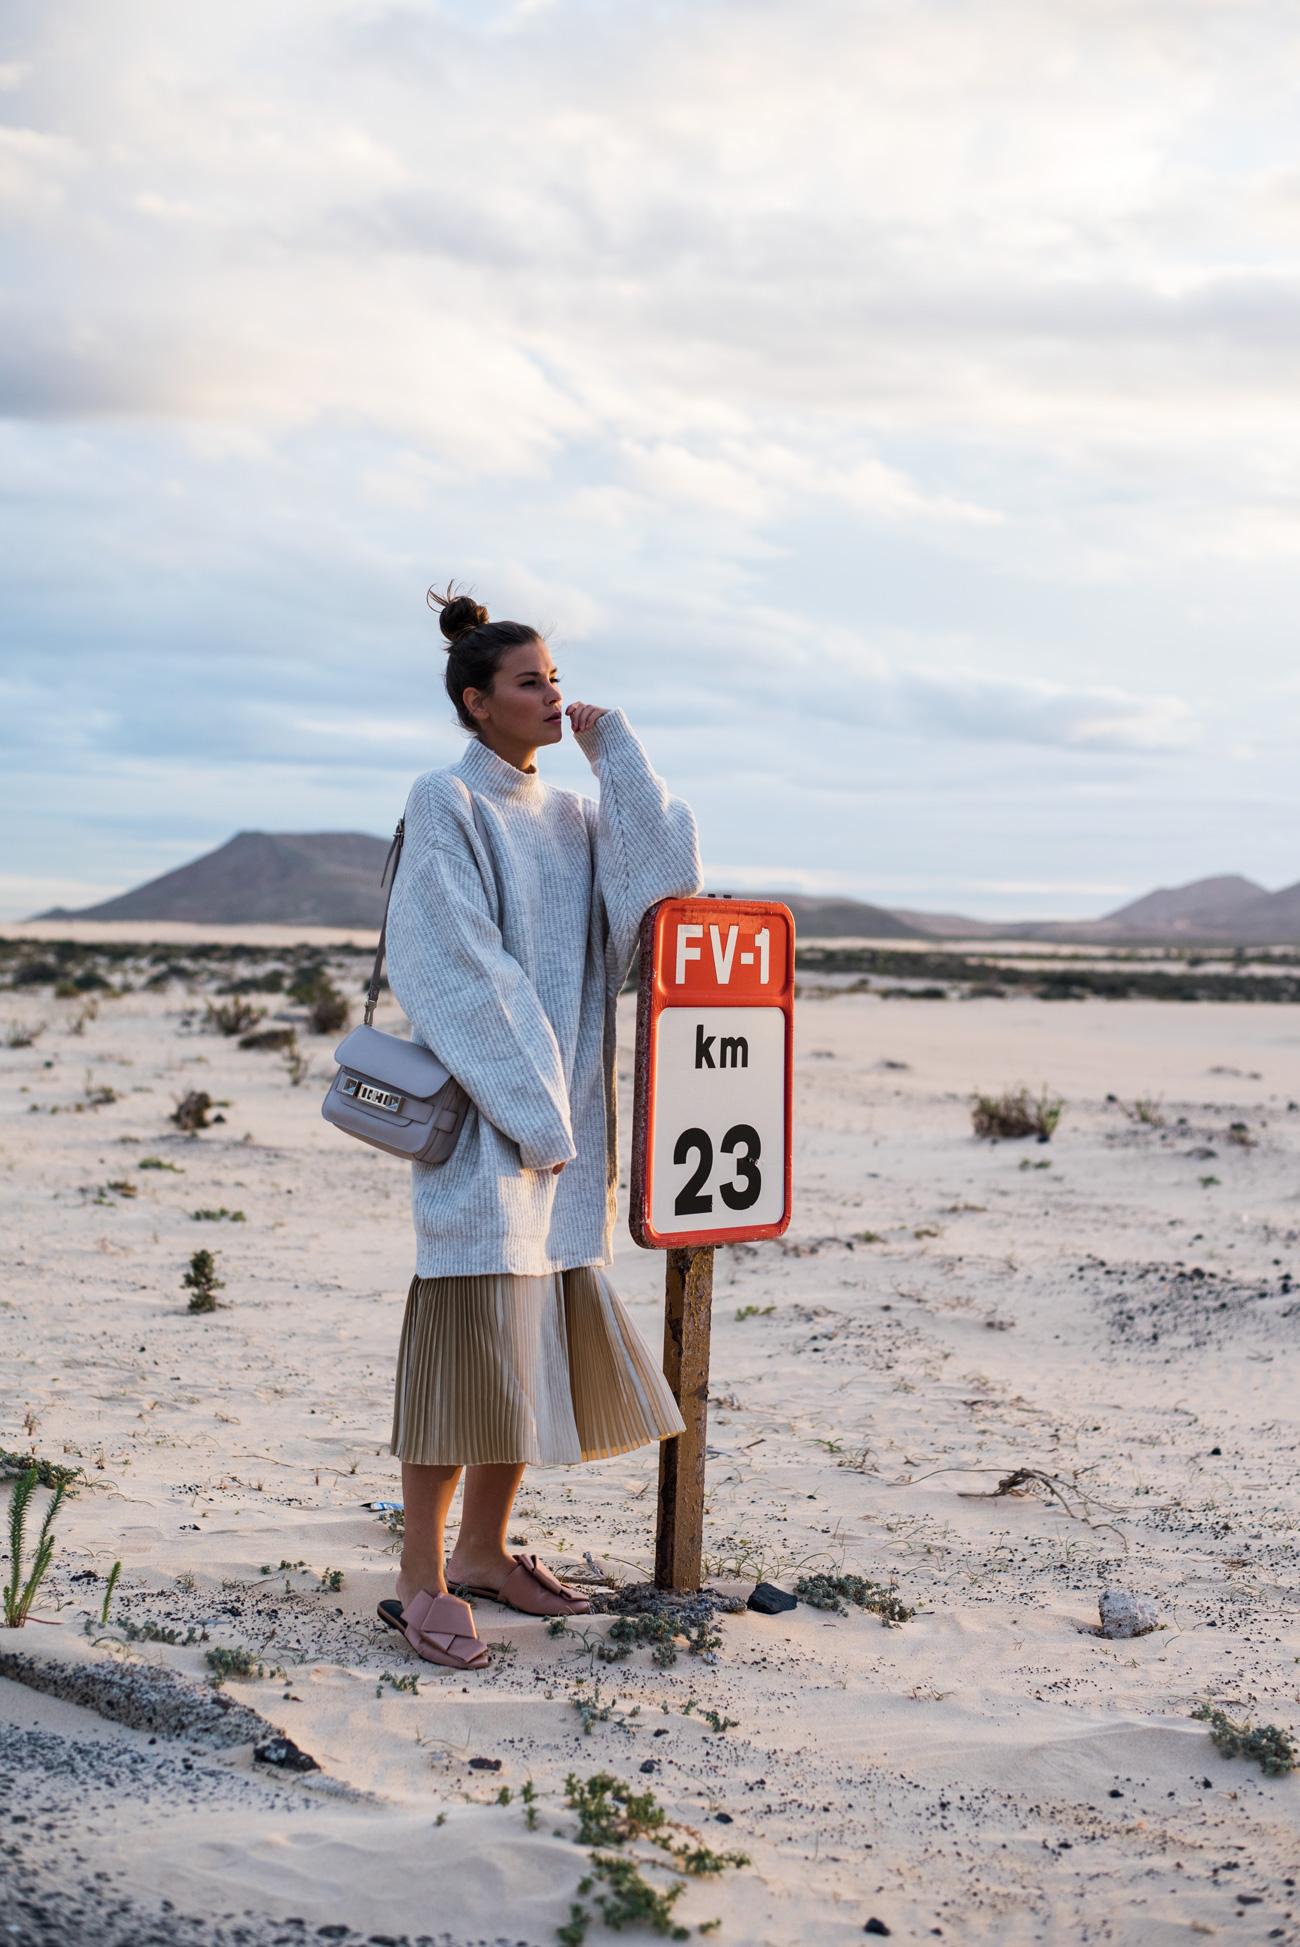 fuerteventura-desert-wueste-shooting-location-fashiioncarpet